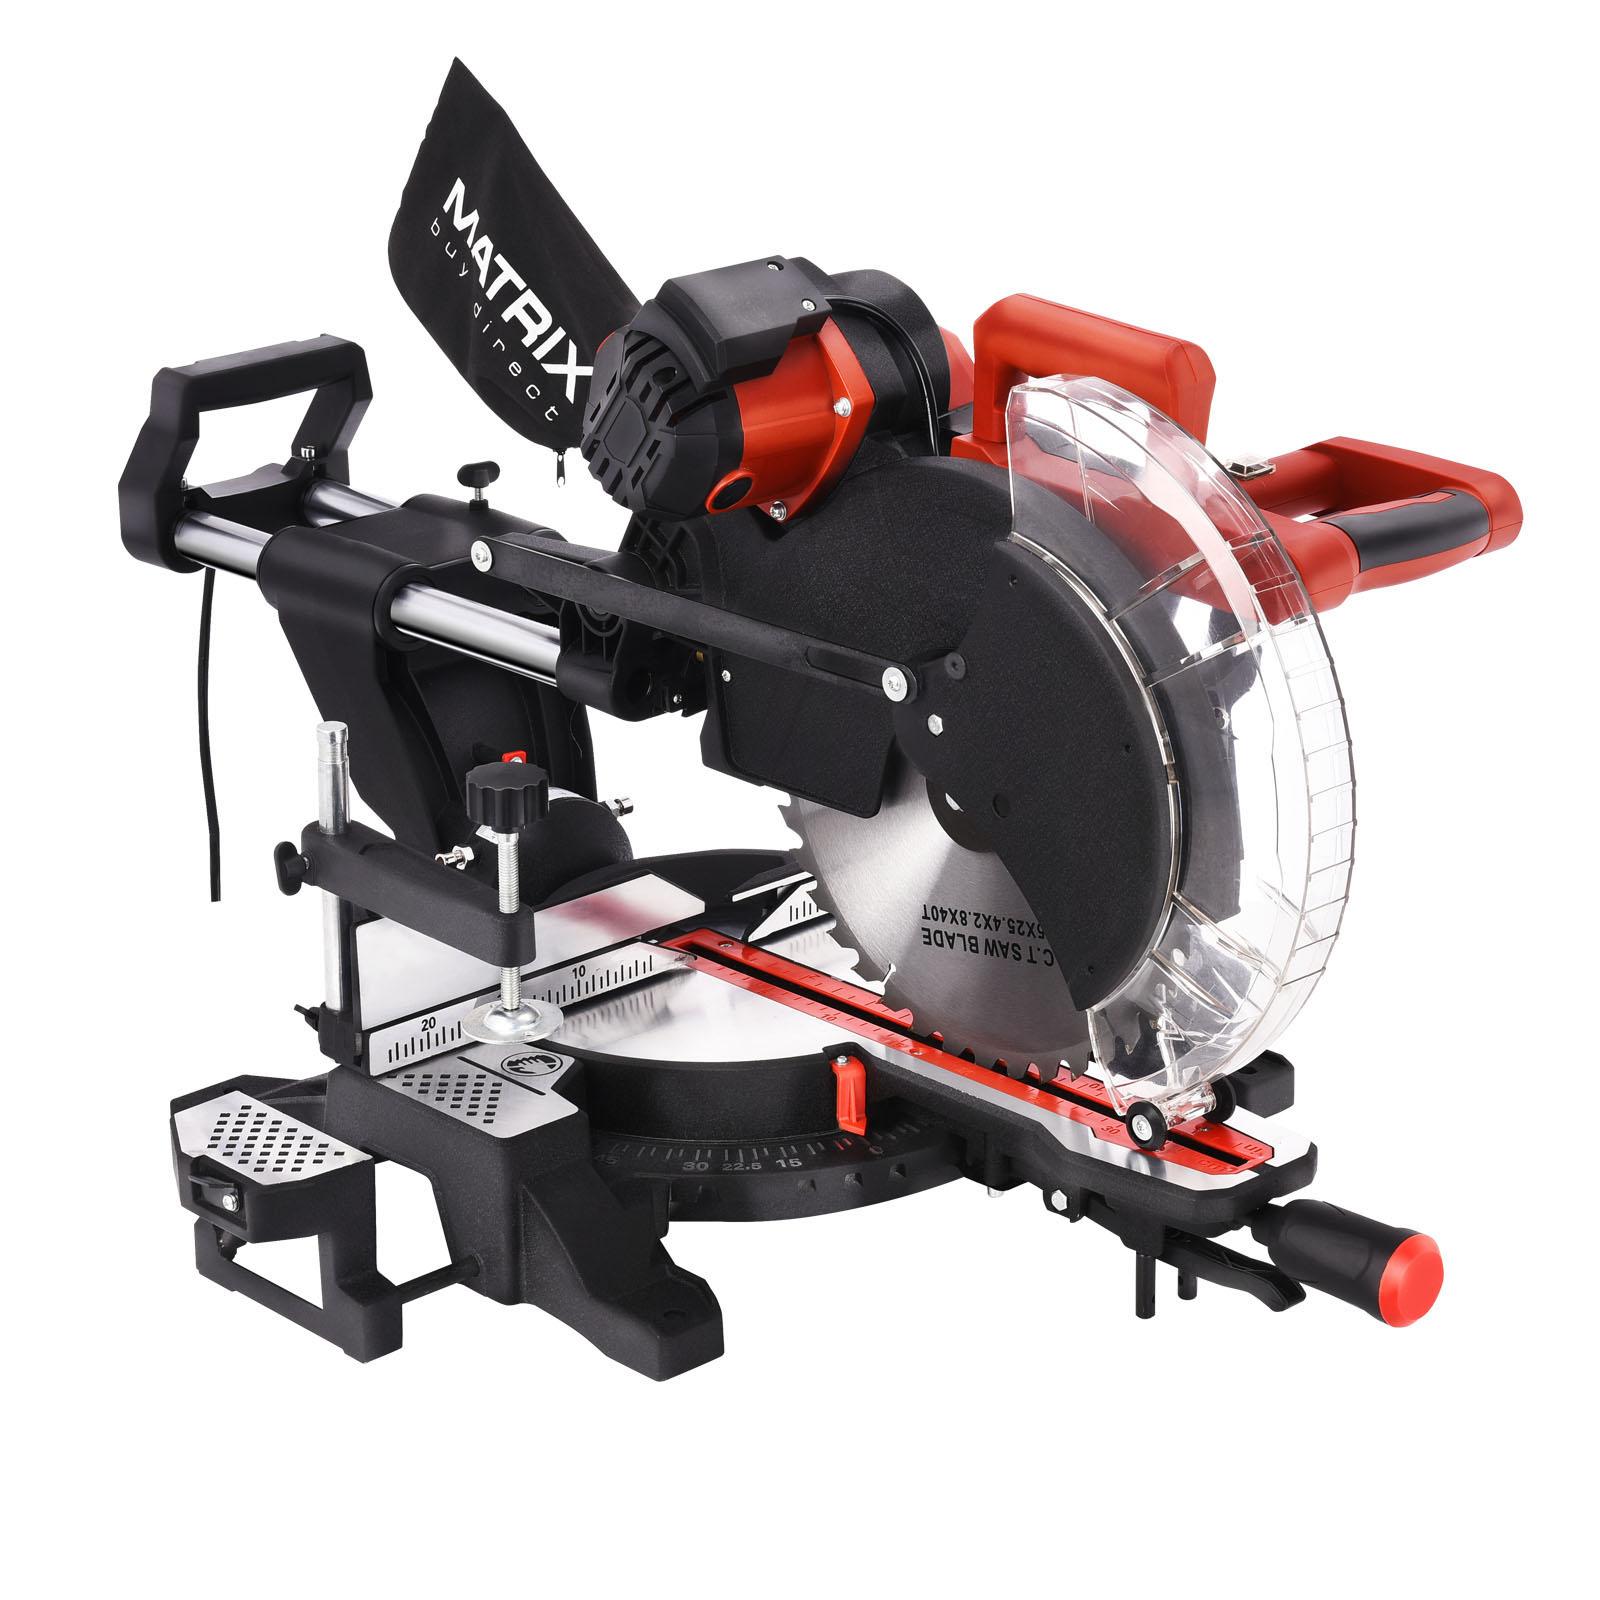 TCT Metal Cutting Saws - trick-tools.com